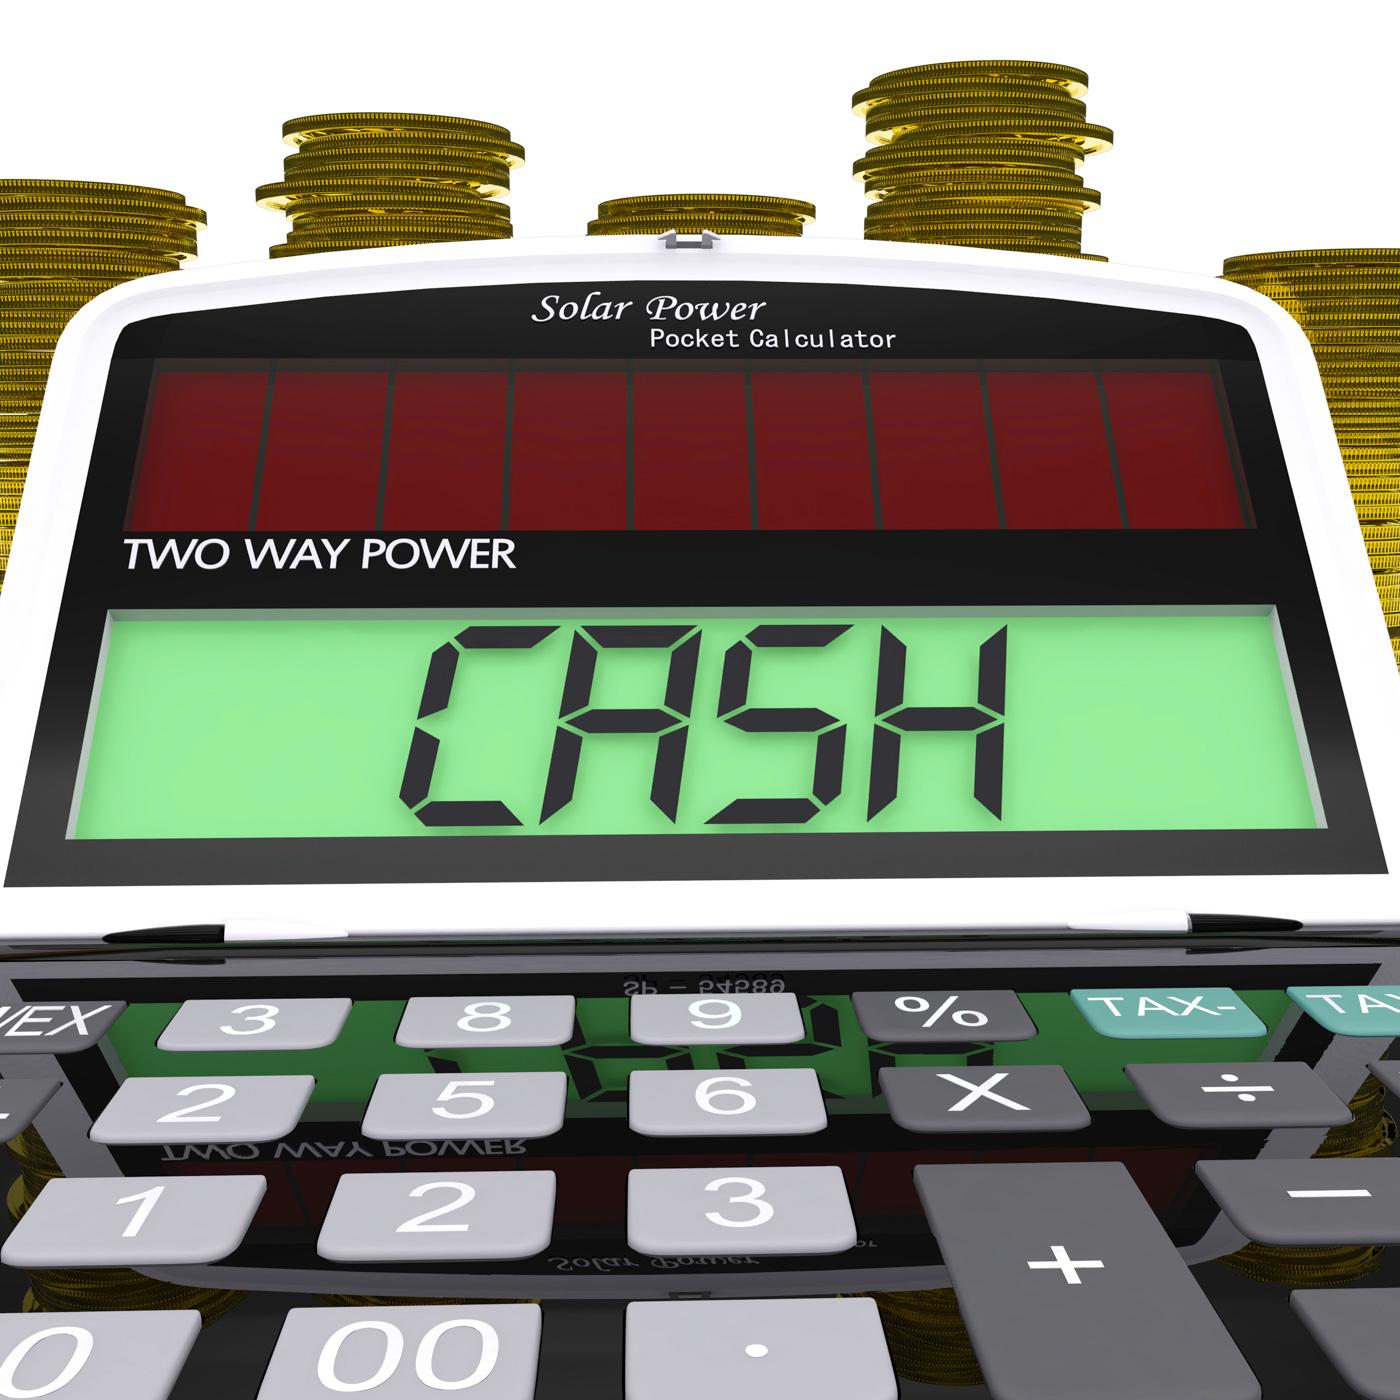 Cash Calculator Means Finances Savings Or Loan, Loan, Spending, Spend, Savings, HQ Photo